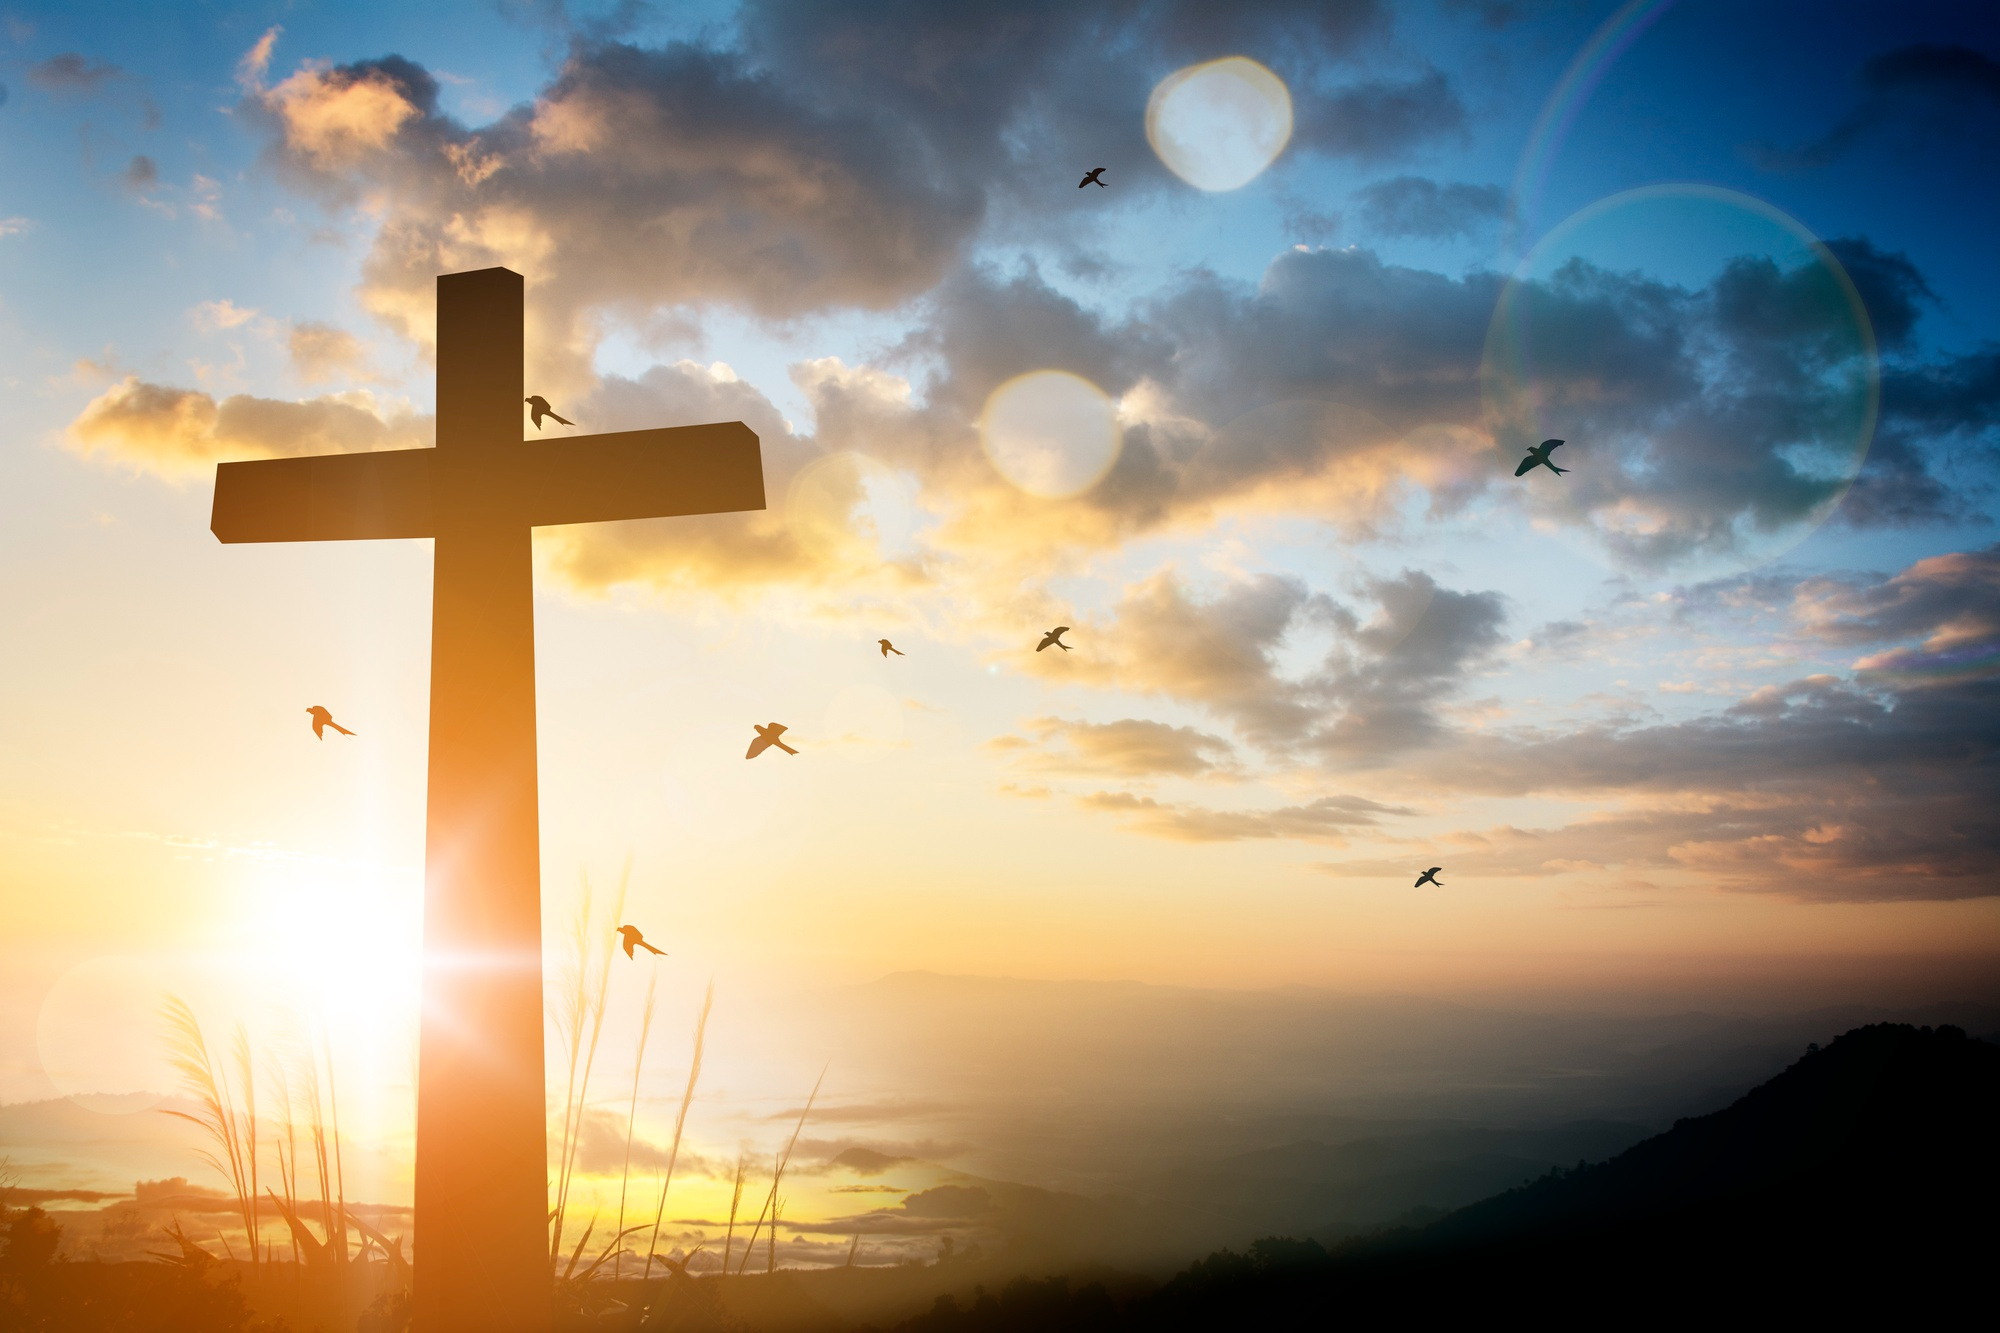 concept-conceptual-black-cross-religion-symbol-silhouette